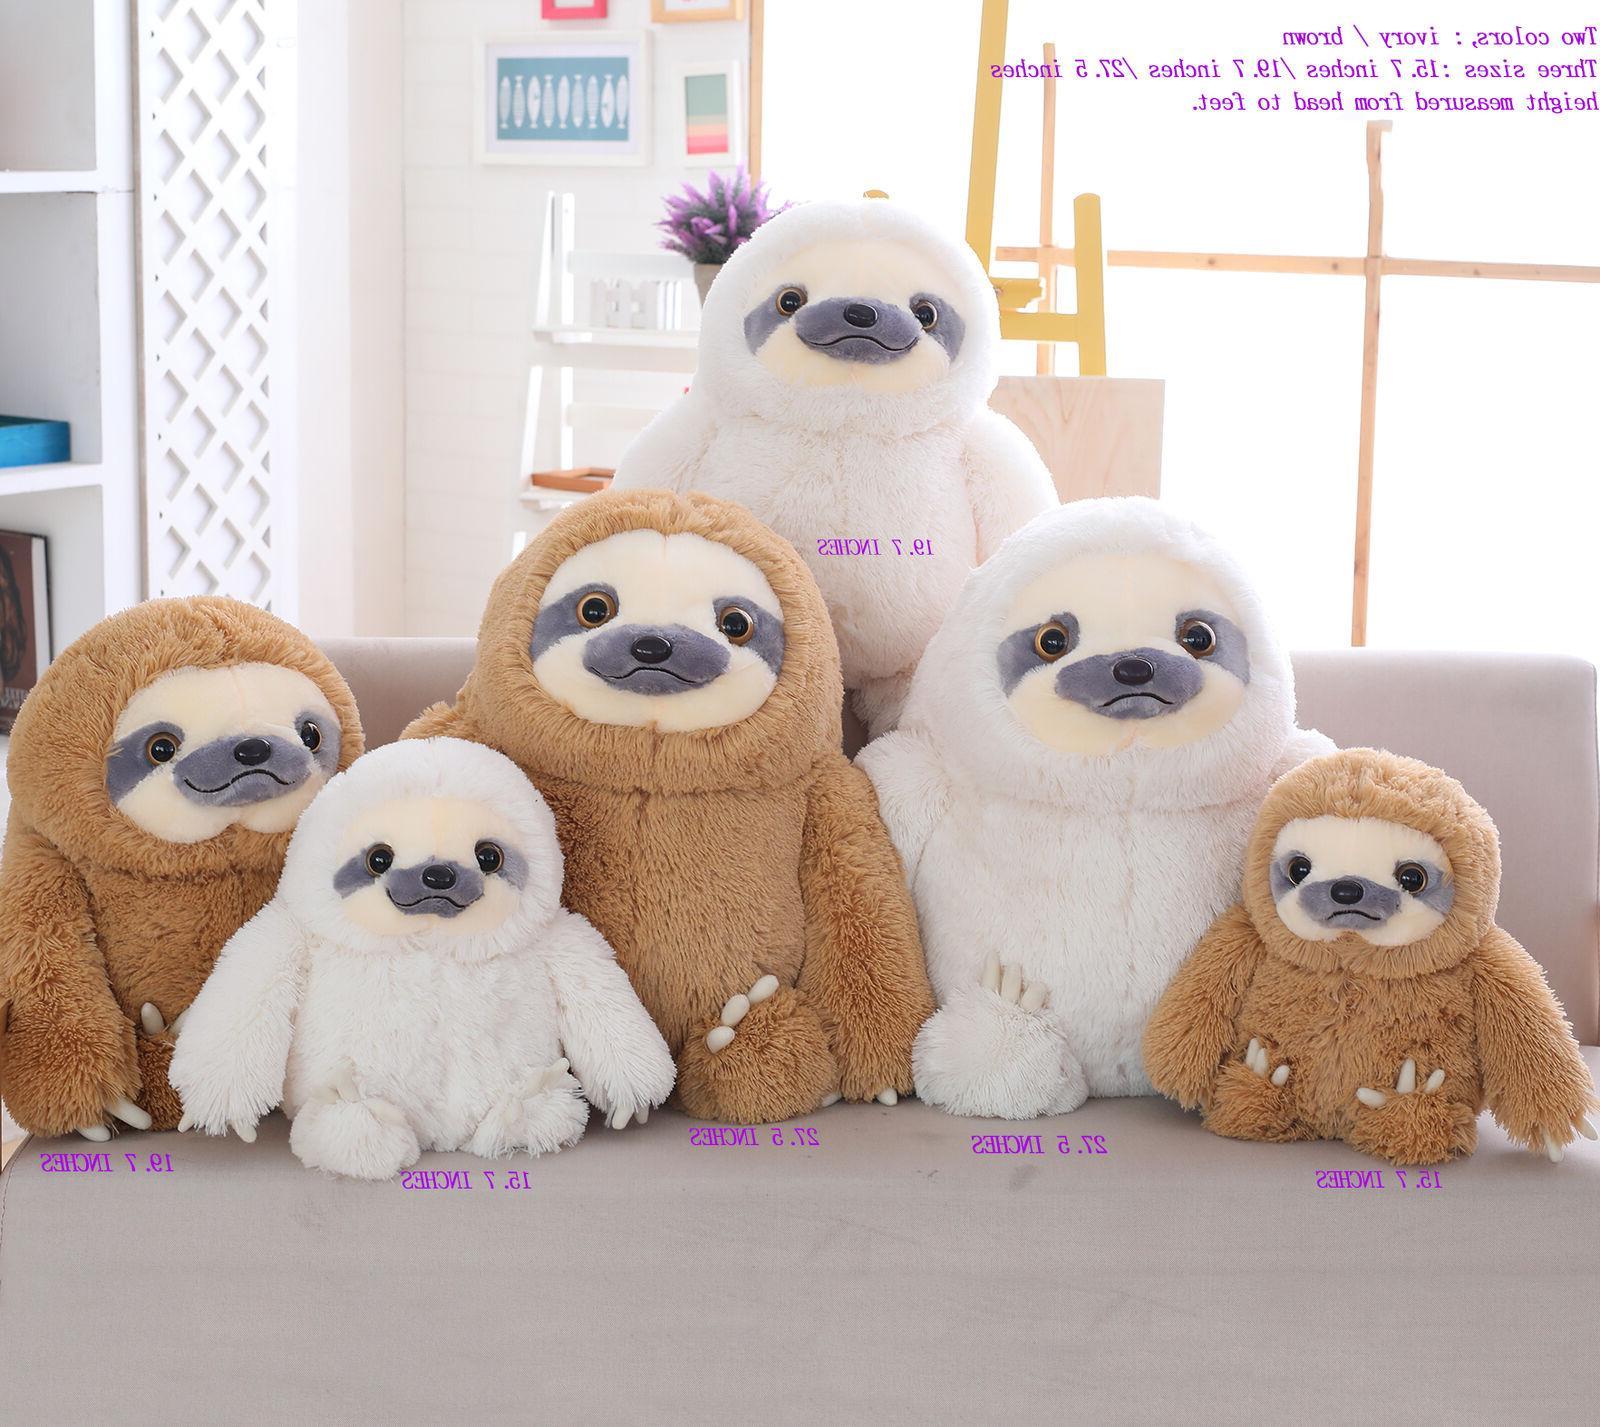 Winsterch Sloth Plush Kids